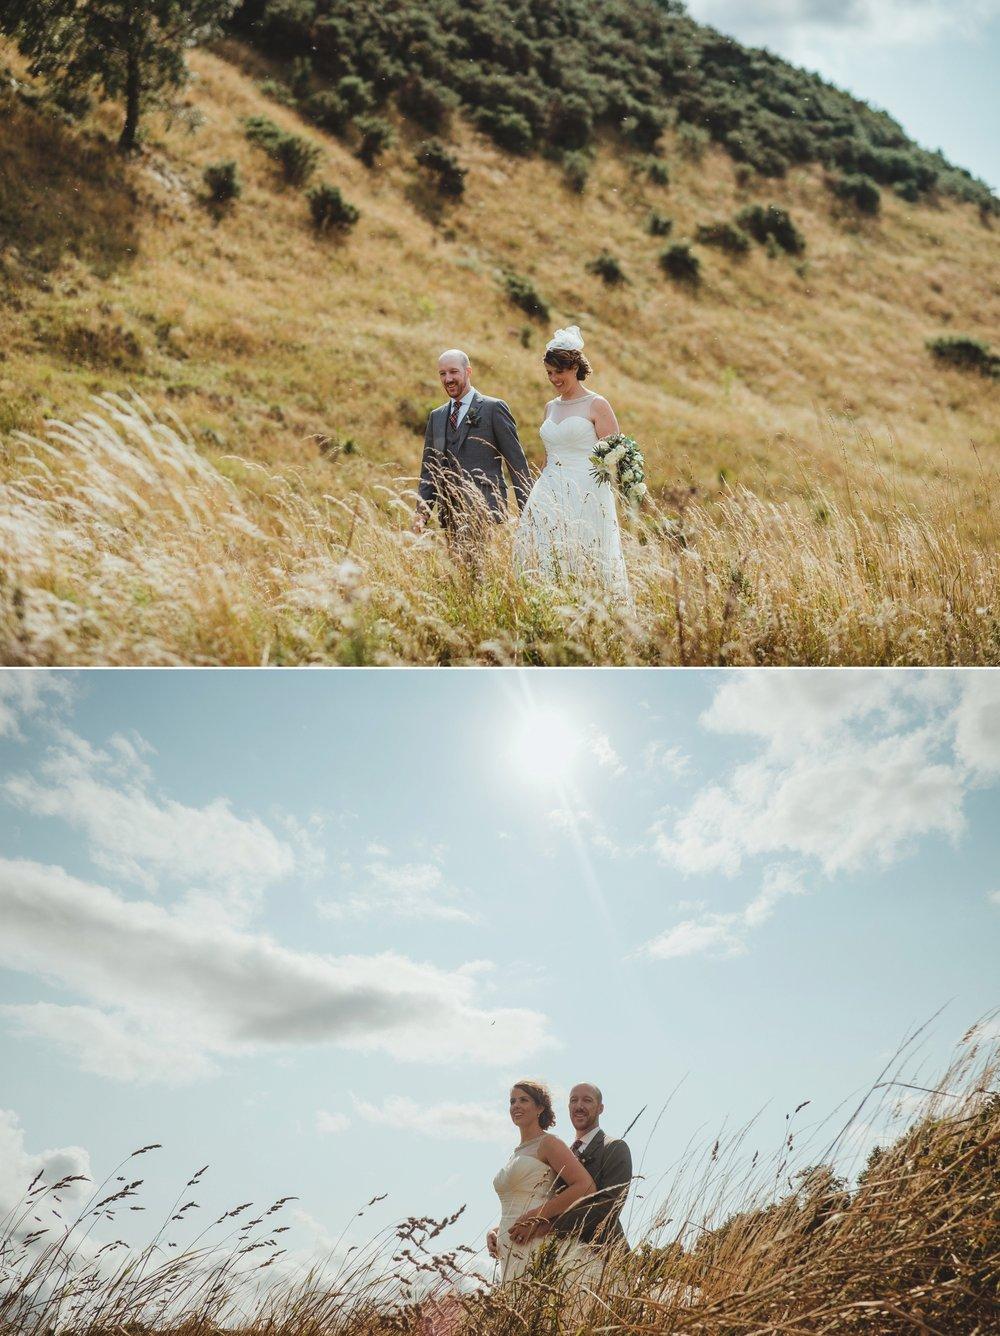 Angela___Andy_s_Edinburgh_elopement_by_Barry_Forshaw_0250.jpg